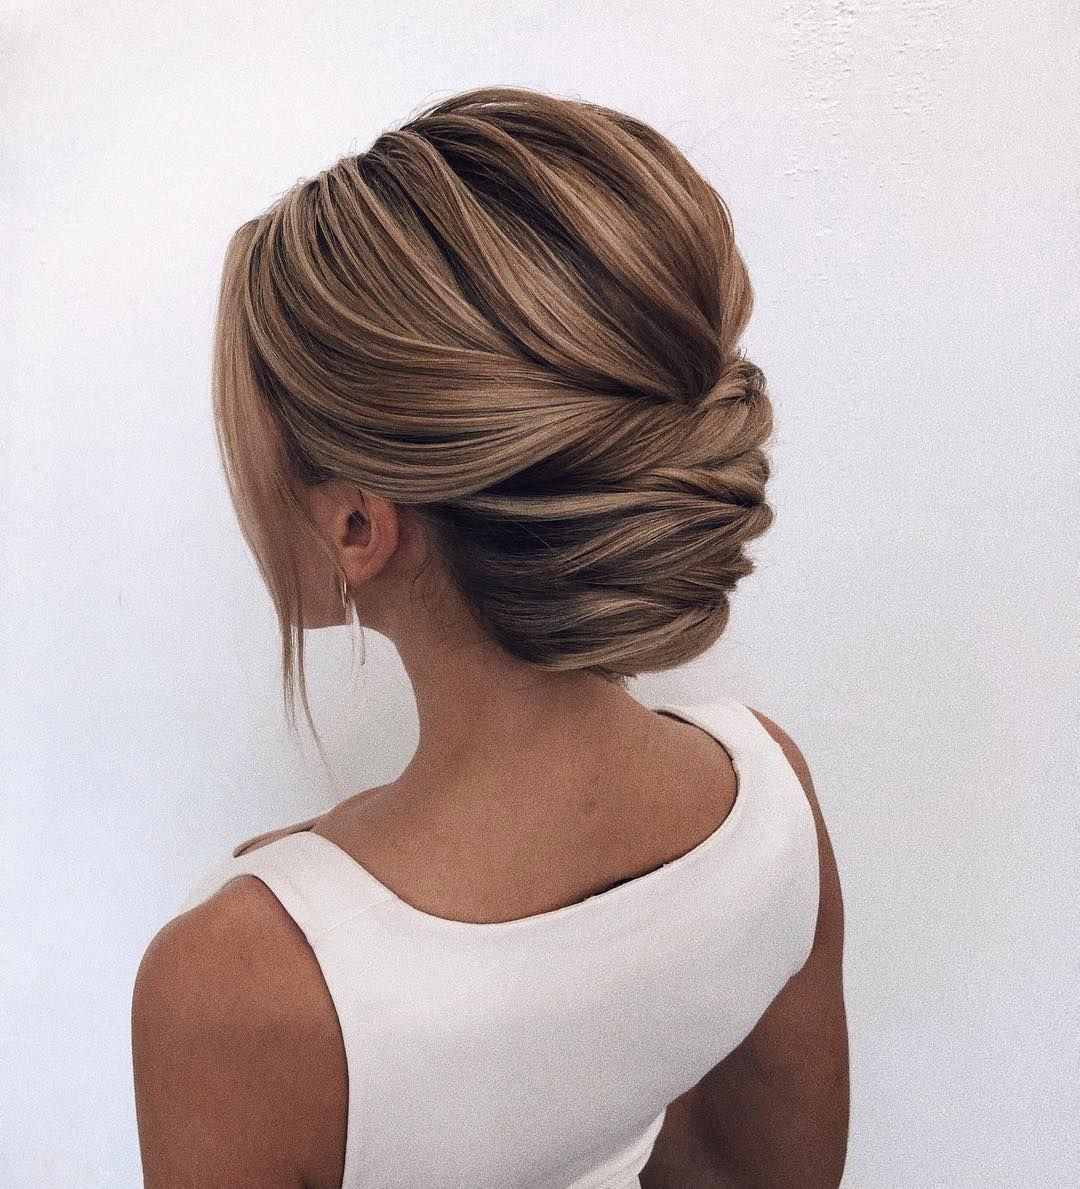 Tight Updo Hairstyles Black Women Braidsforshorthair Hair Styles Wedding Hair Inspiration Updos For Medium Length Hair